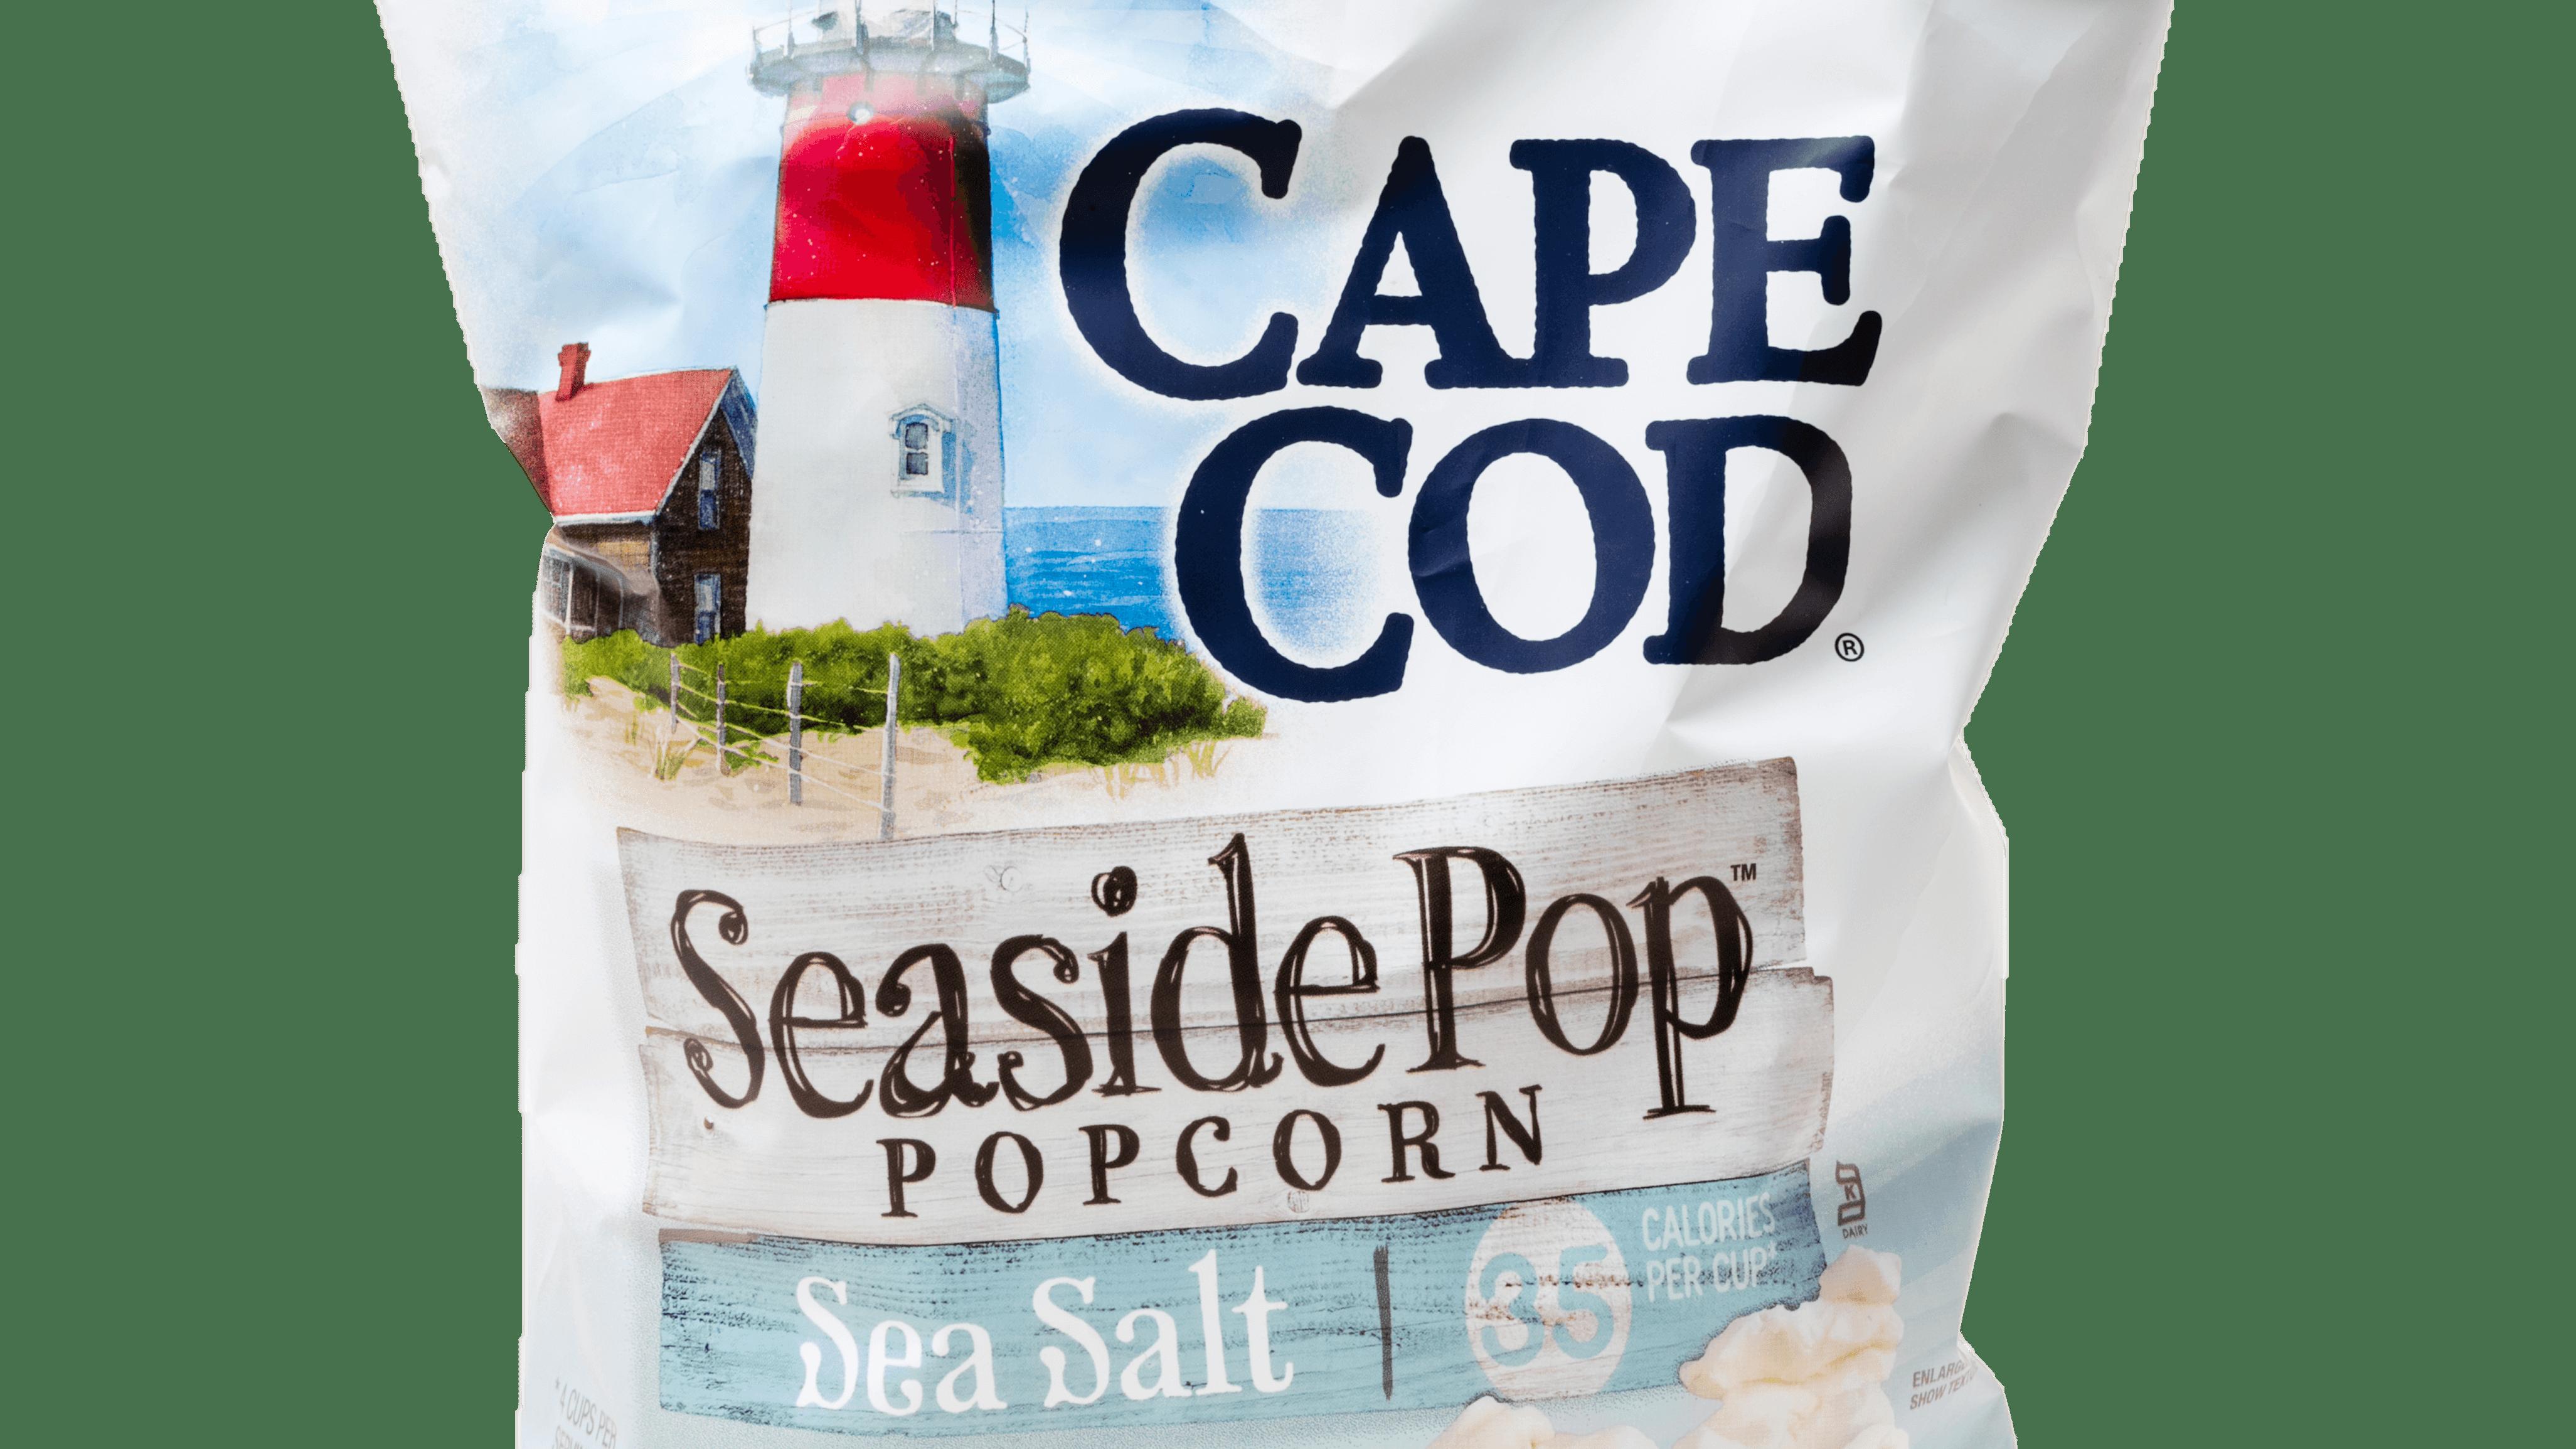 34205 sil bagged popcorn cape cod sea salt popcorn